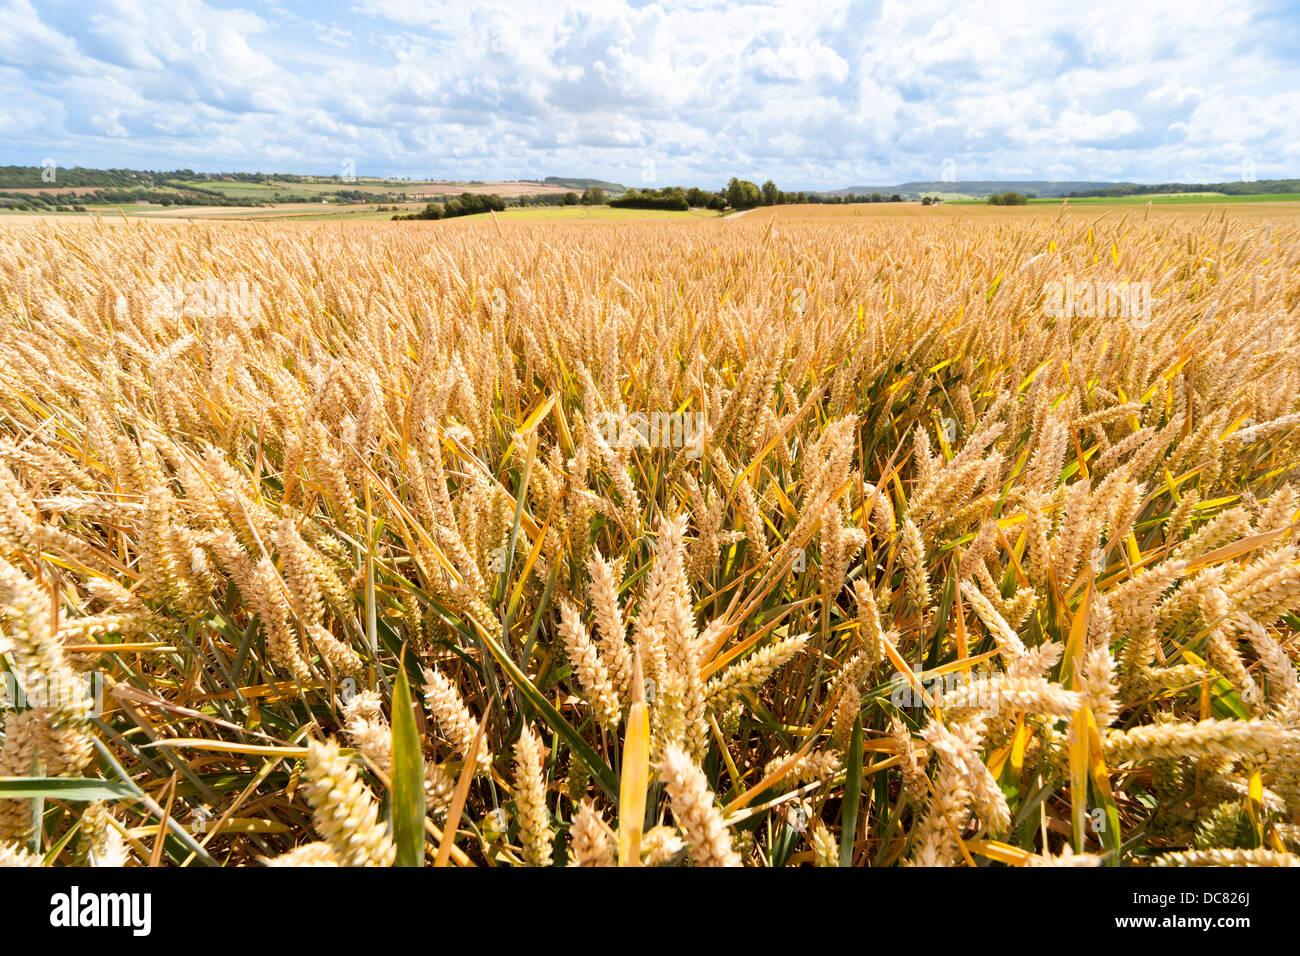 https://c7.alamy.com/comp/DC826J/ears-of-wheat-grain-in-wheat-field-fields-wheatfield-wheatfields-in-DC826J.jpg